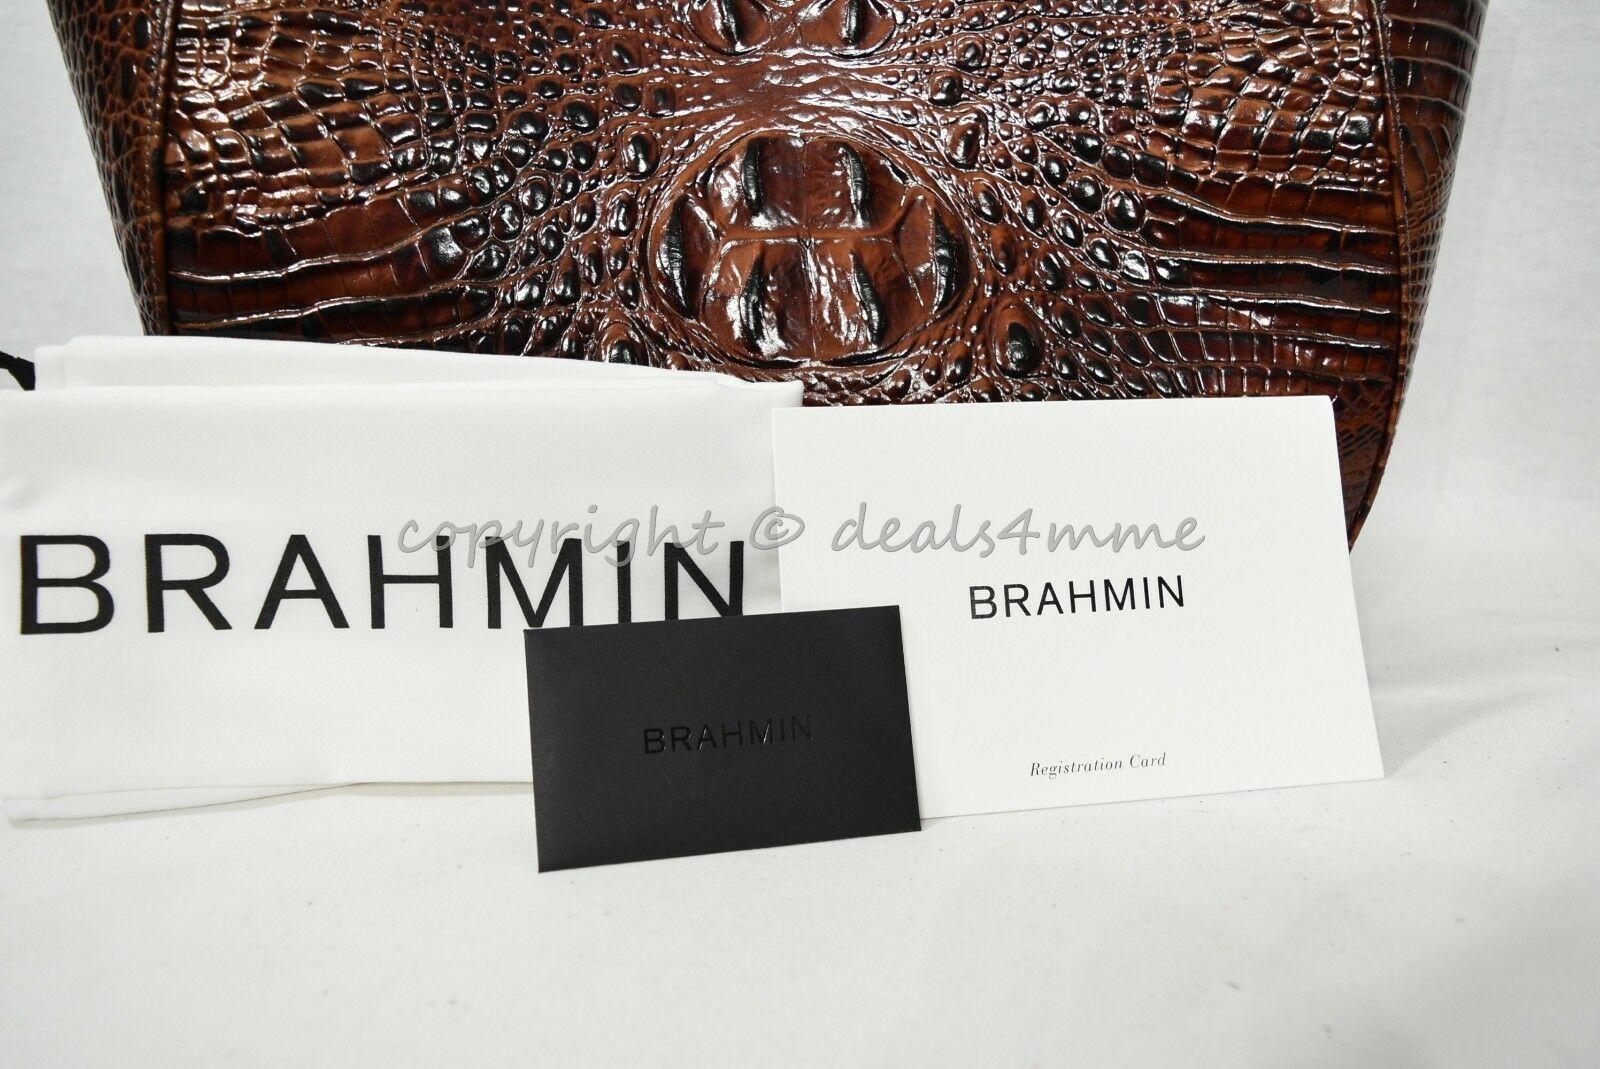 NWT Brahmin Marianna Leather Tote / Shoulder Bag in Pecan Melbourne image 5